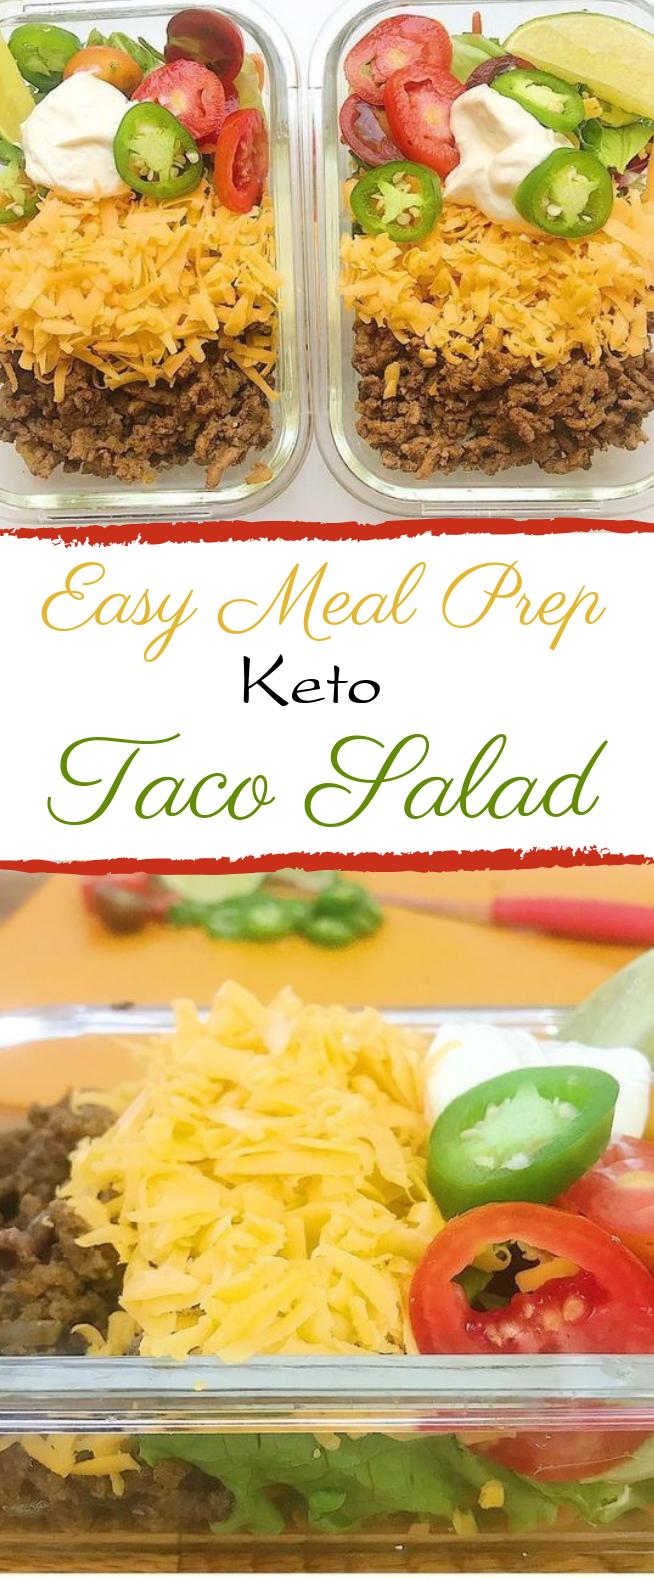 Easy Meal Prep Keto Taco Salad #lunch #keto